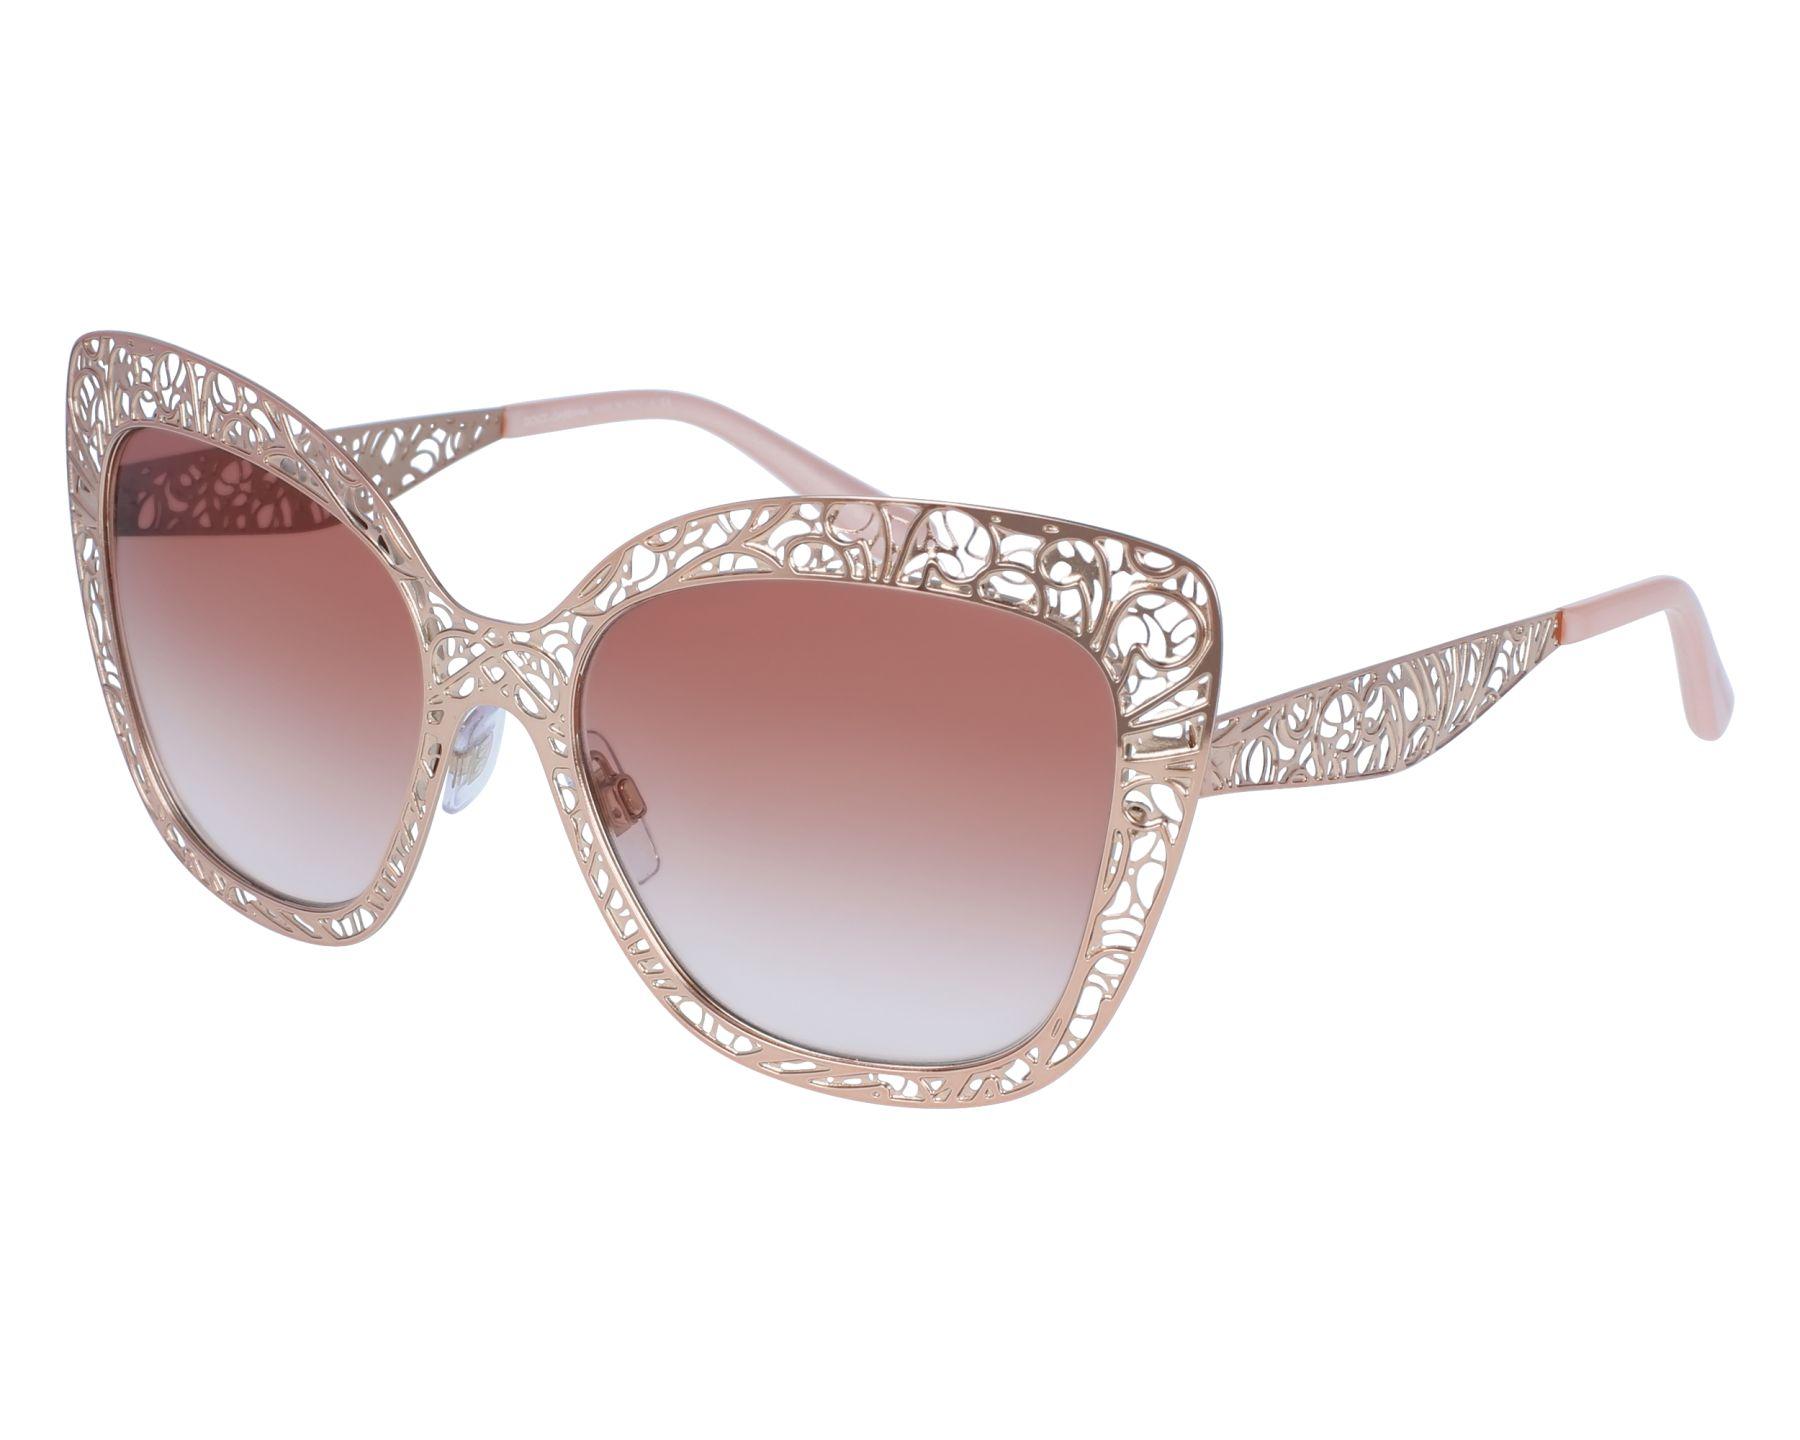 Dolce & Gabbana DG2164 02/13 56-18 0YNBtwvO9